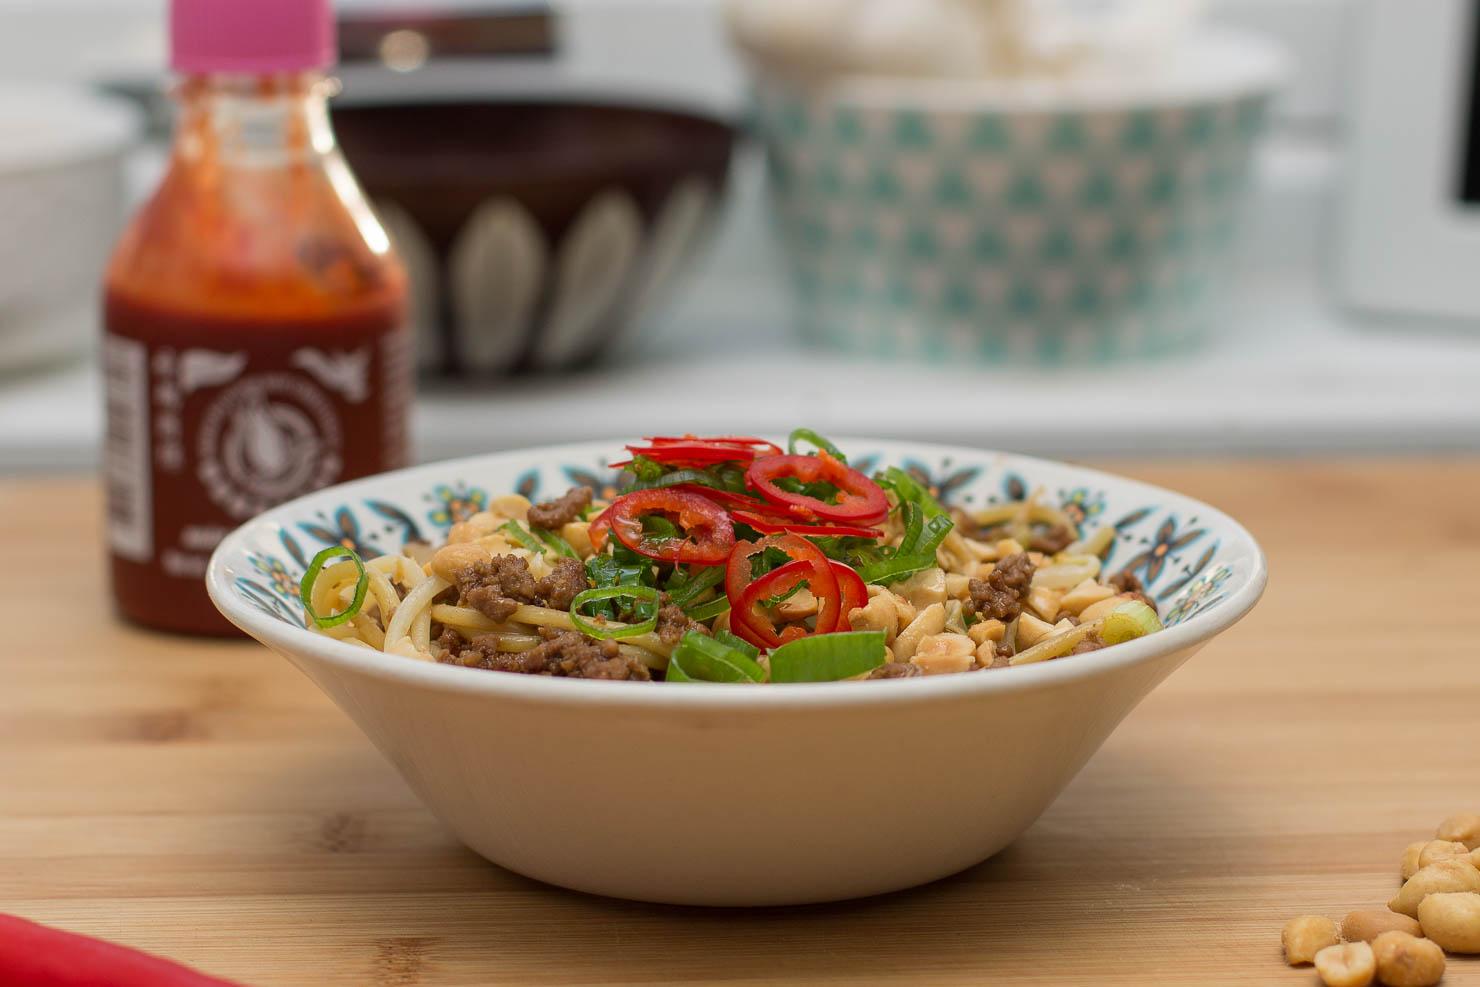 Spicy asiatiskinspirert spaghetti